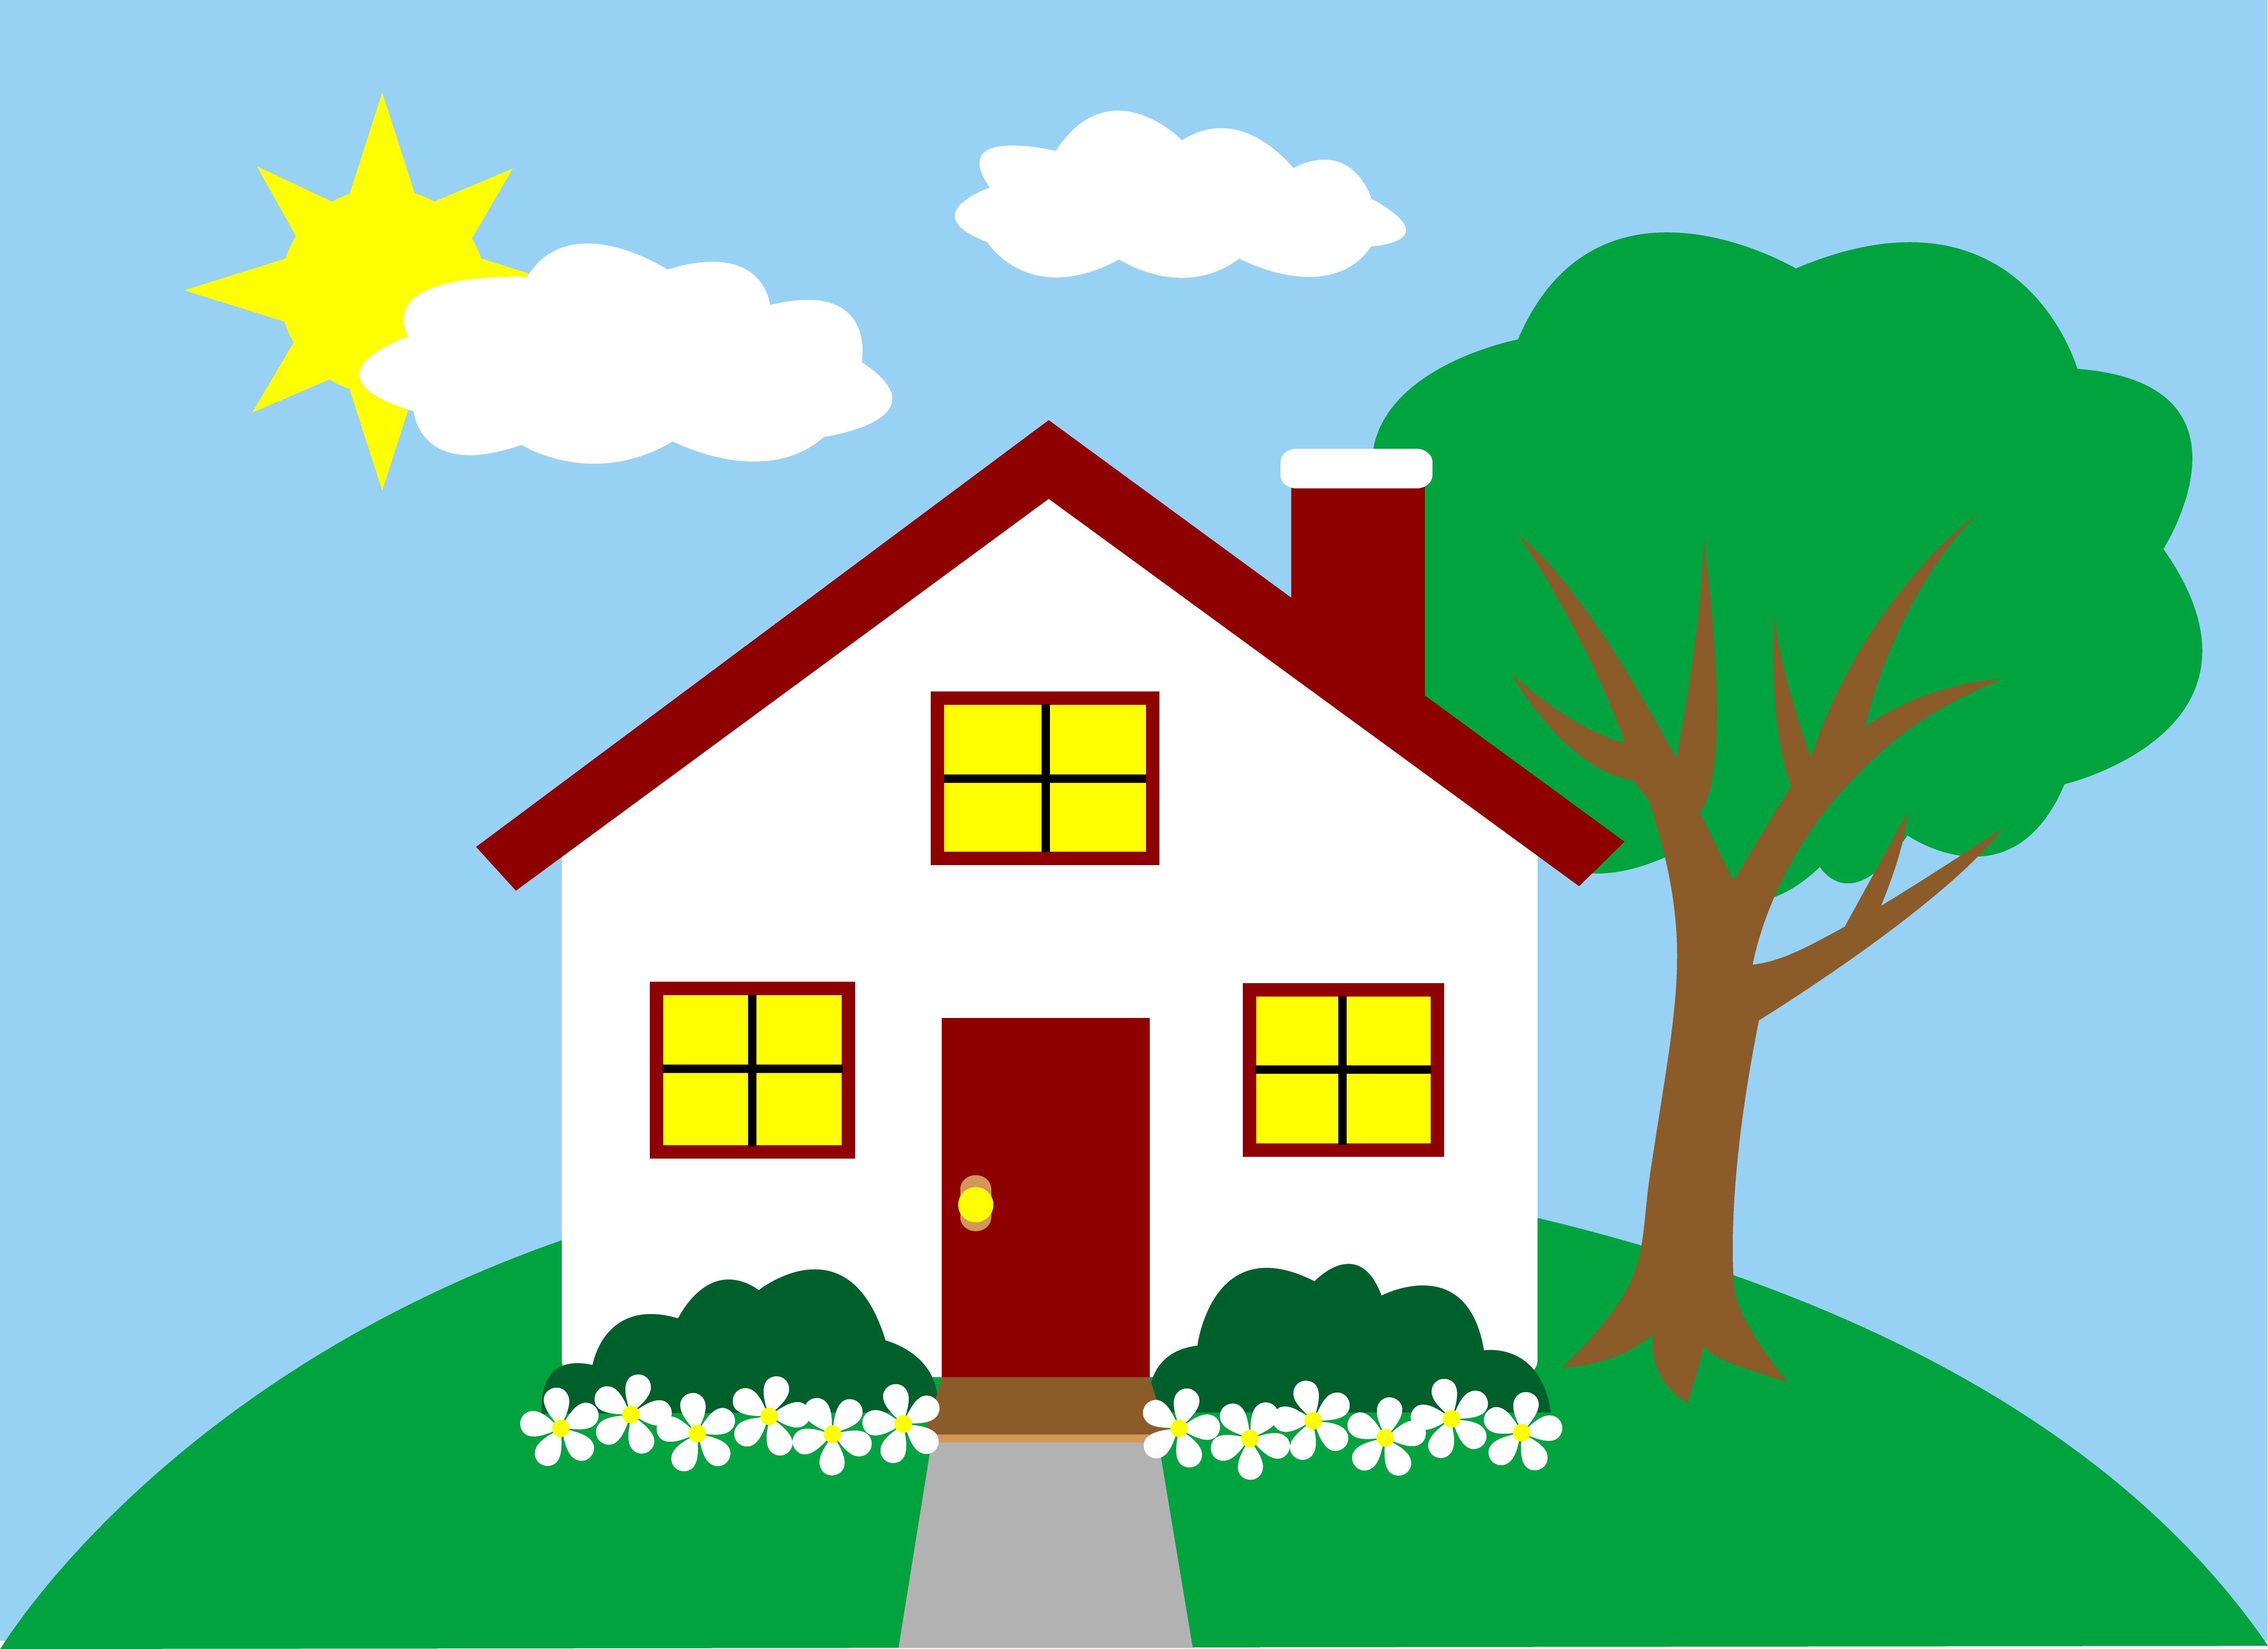 clipart house-clipart house-4